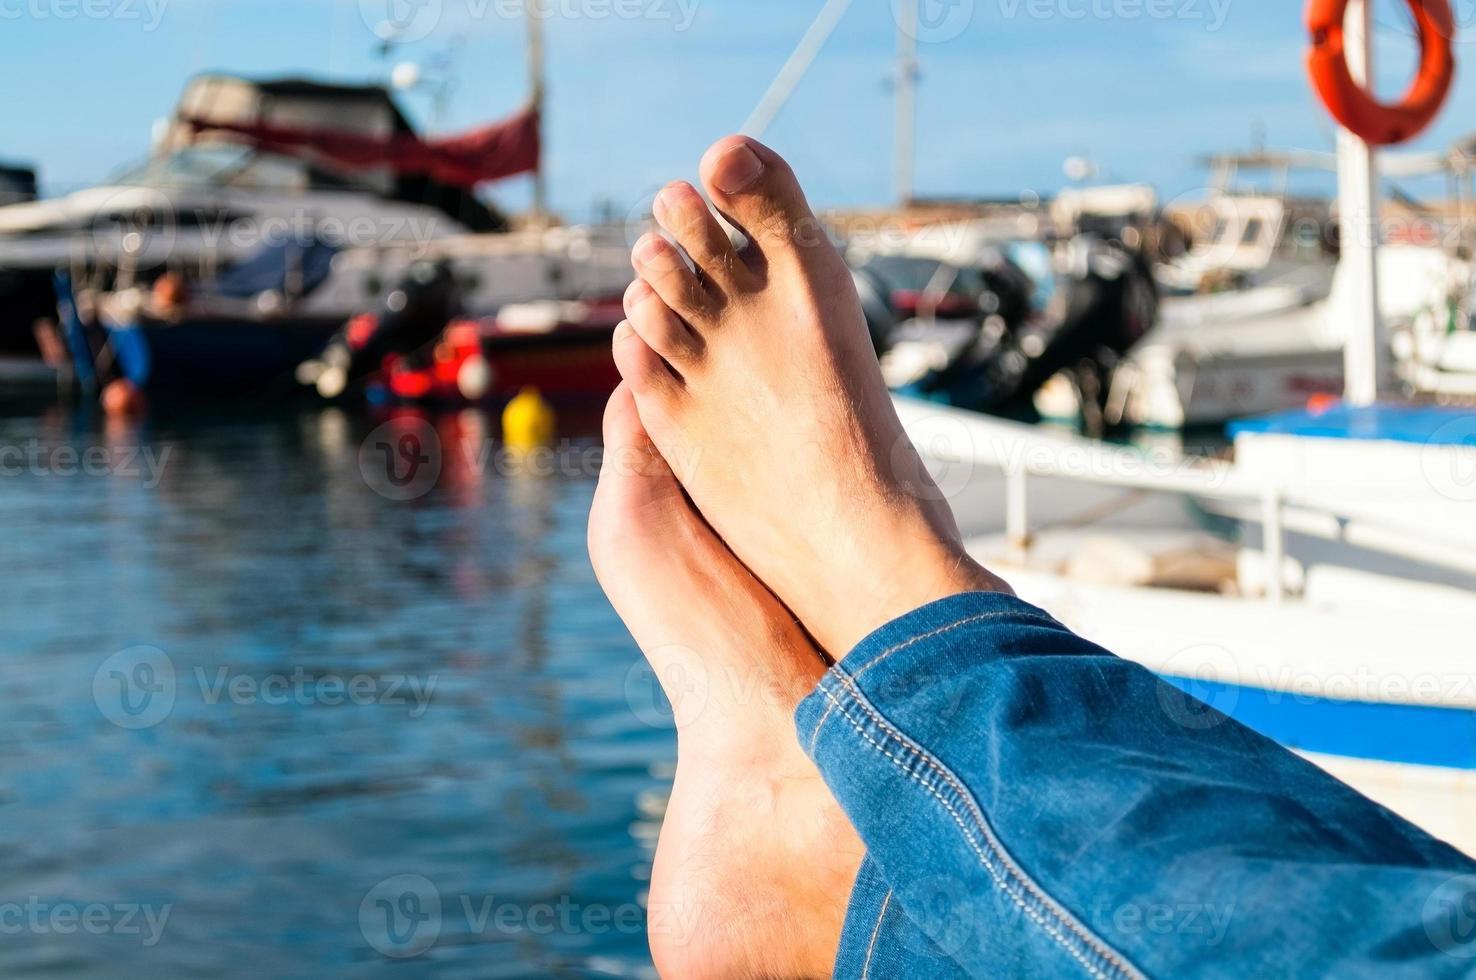 pies masculinos frente al mar foto